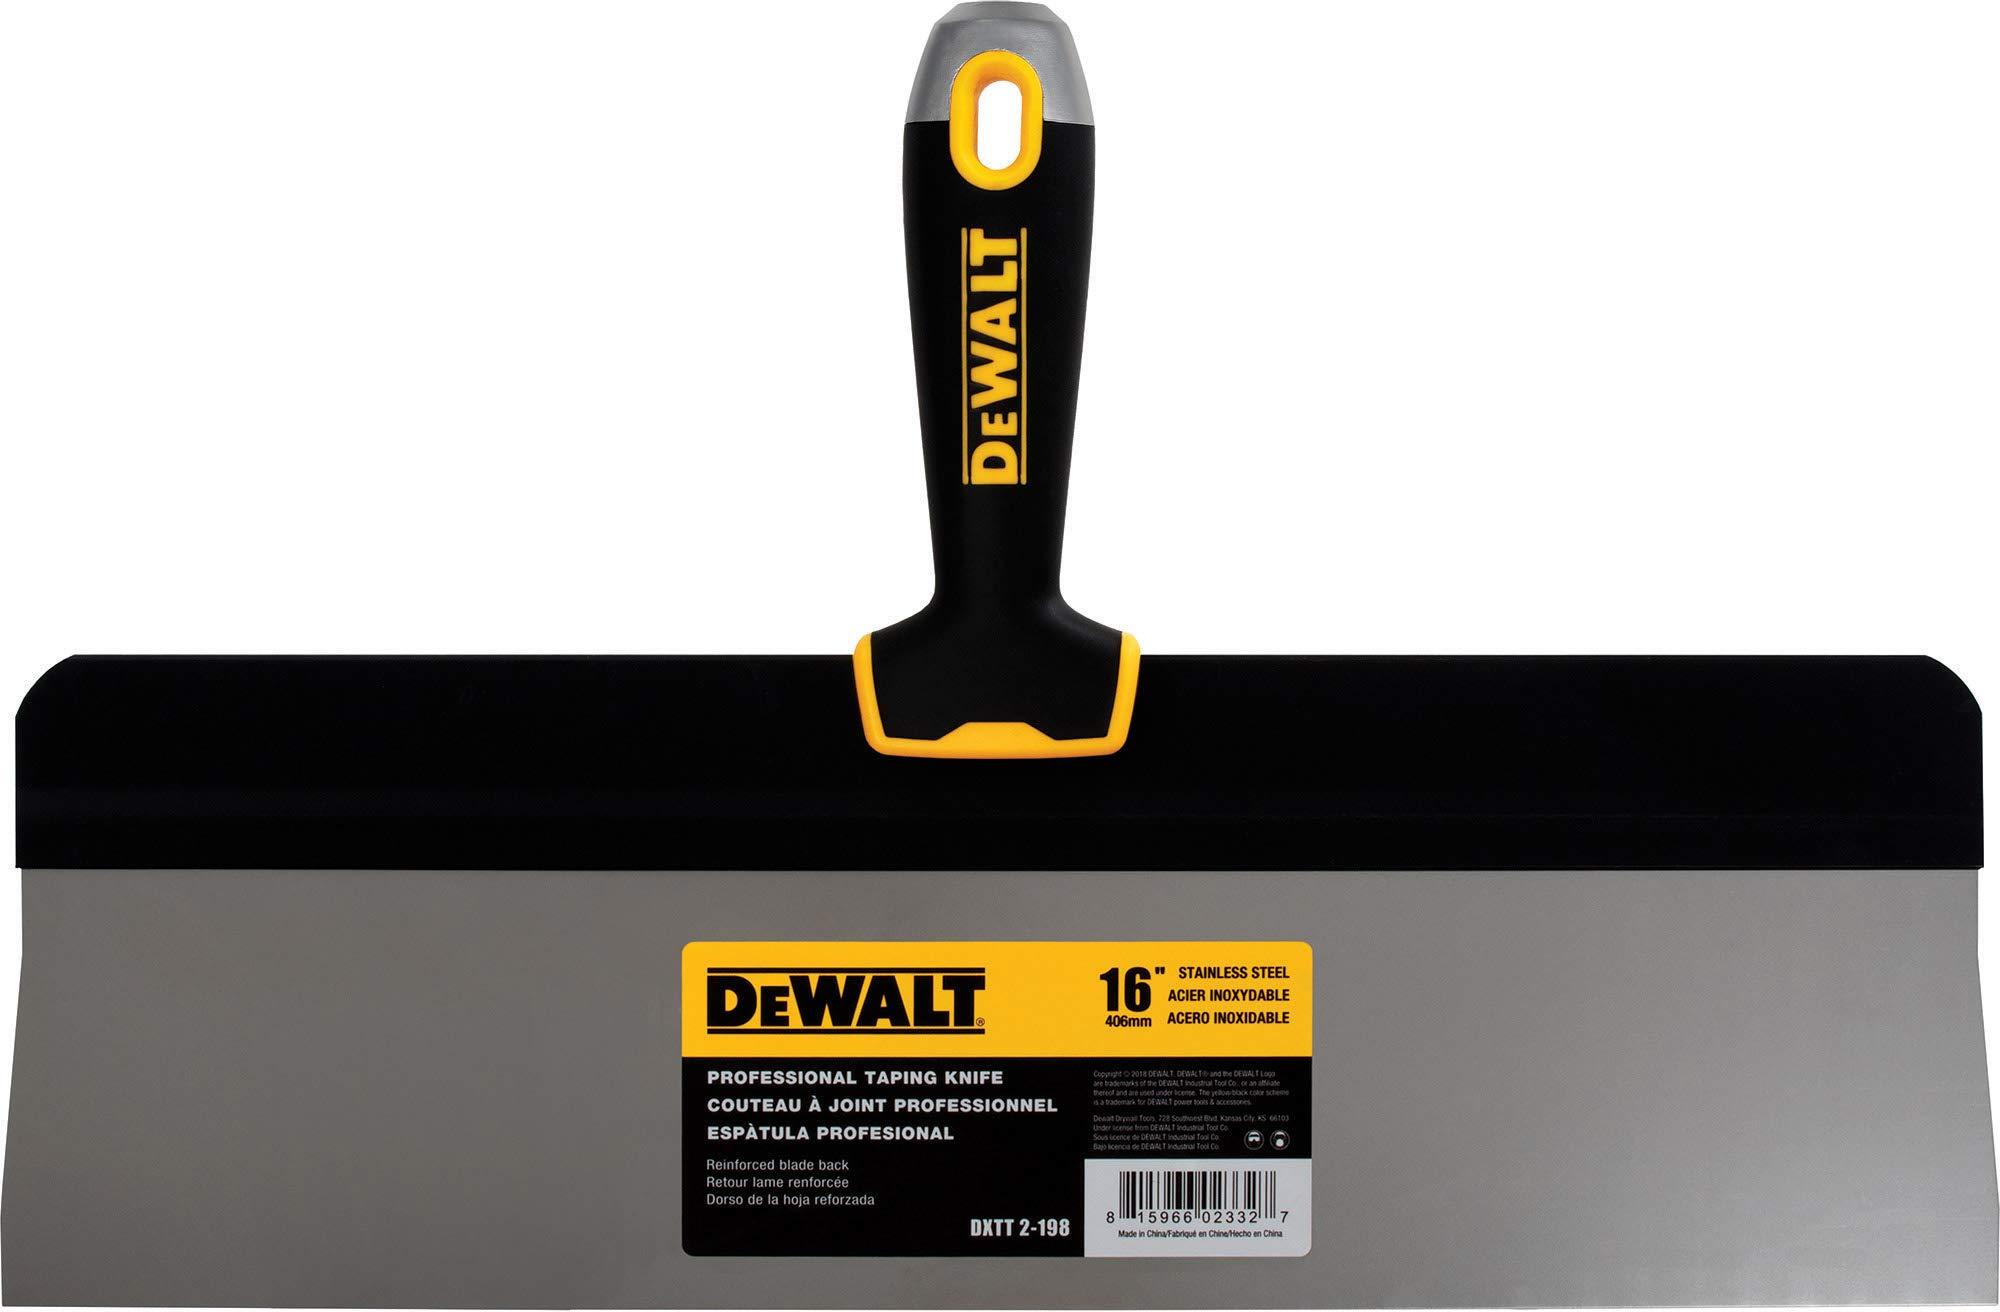 DEWALT 16-Inch Big Back Taping Knife | Stainless Steel w/Soft Grip Handle by DEWALT